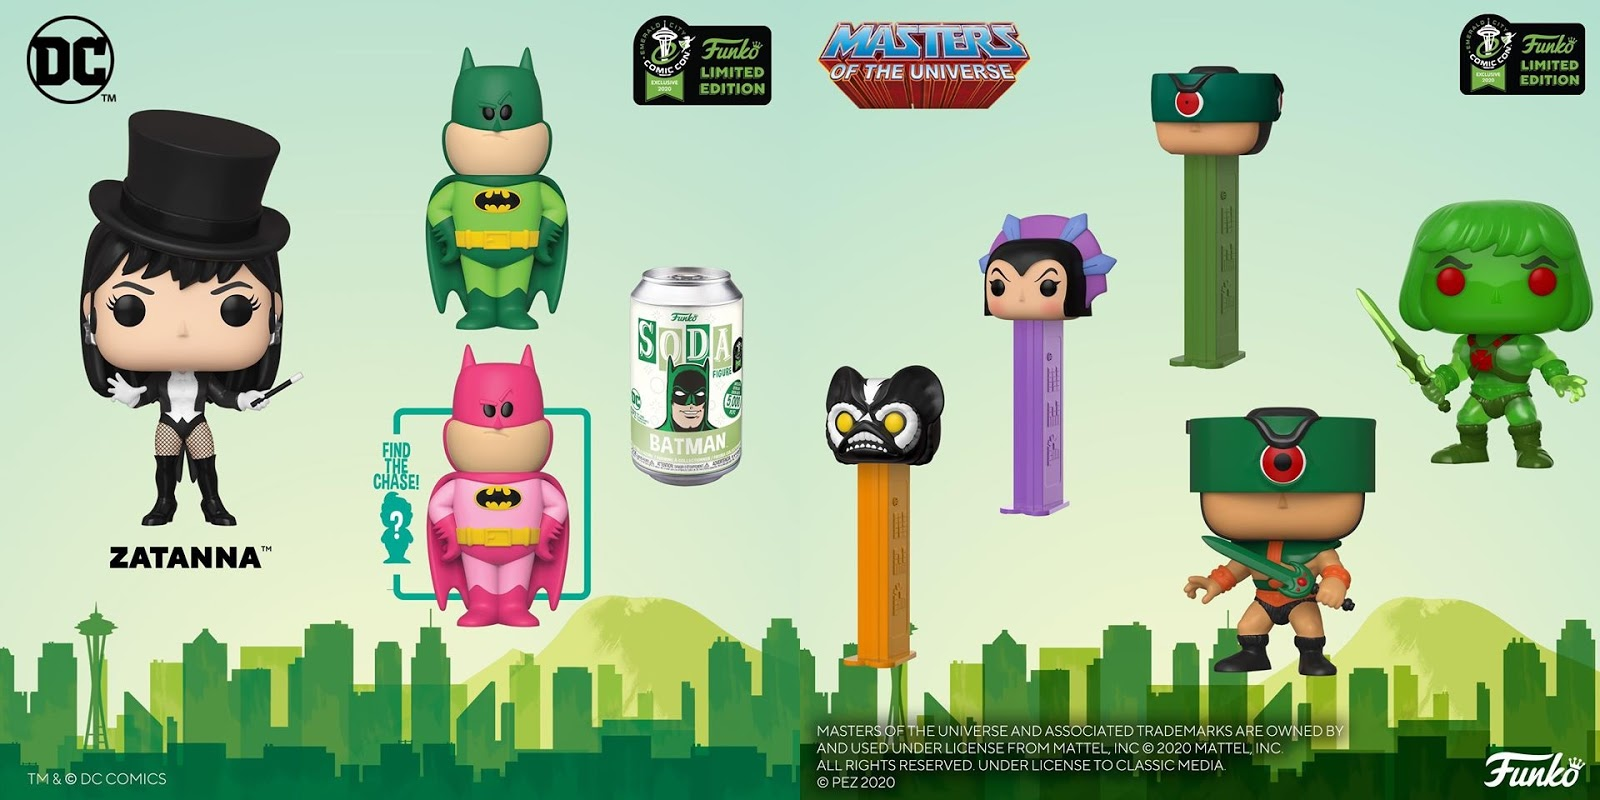 The Blot Says Funko S Emerald City Comic Con 2020 Exclusives Part 1 Batman Dbz Scott Pilgrim Motu More